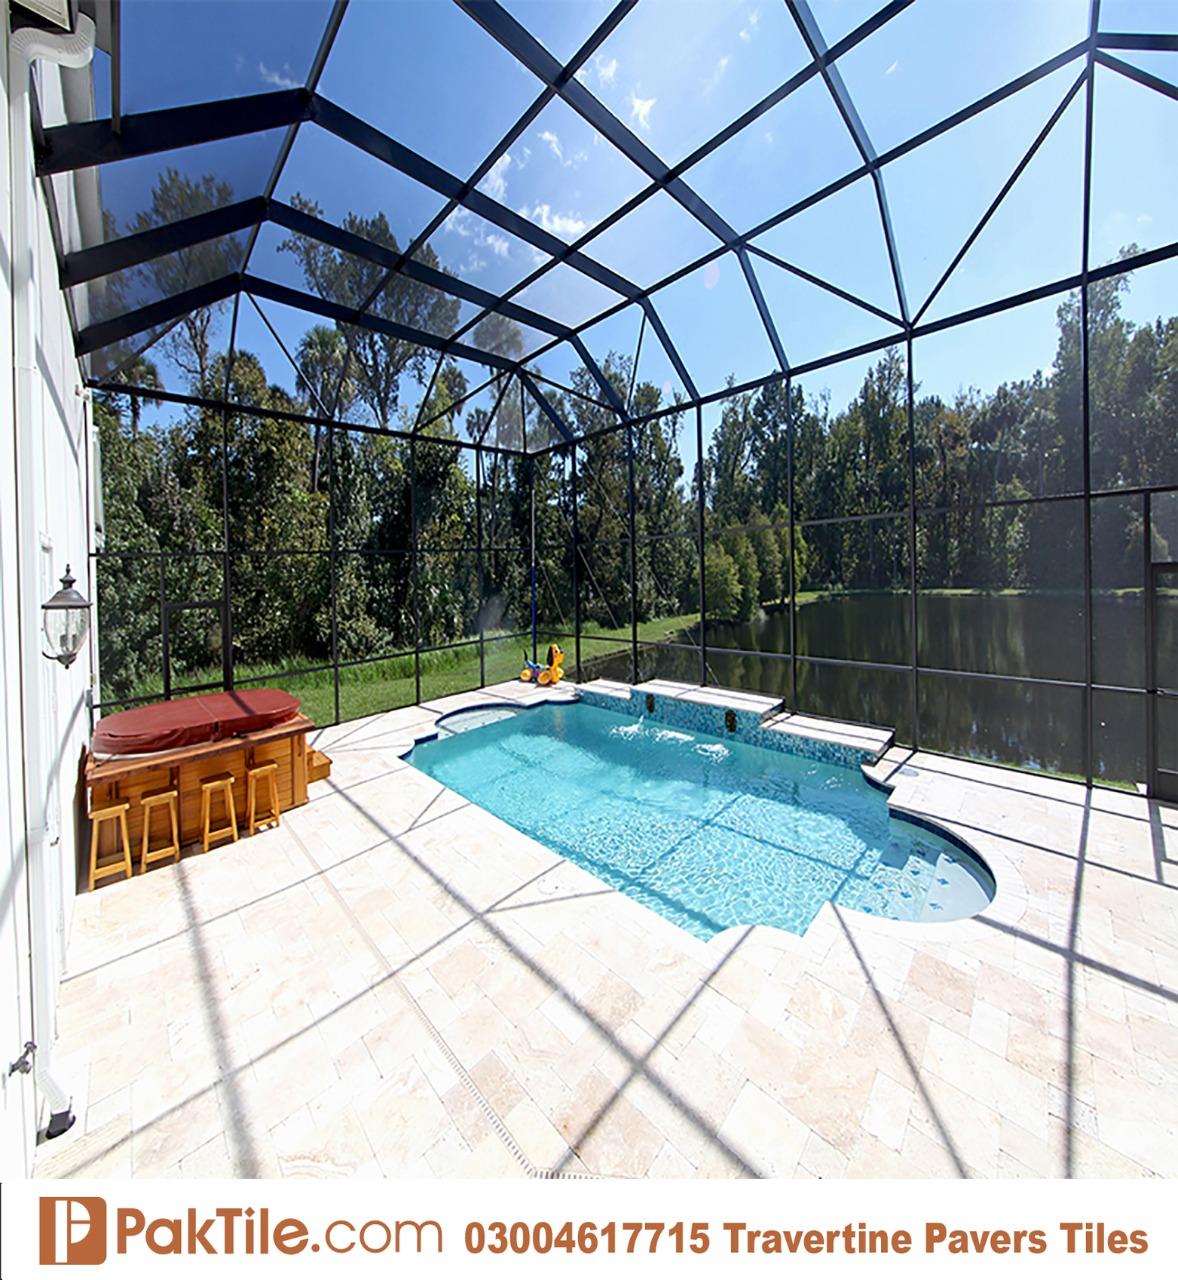 Pak Tiles Walnut Travertine Swimming Pool Pavers Tiles